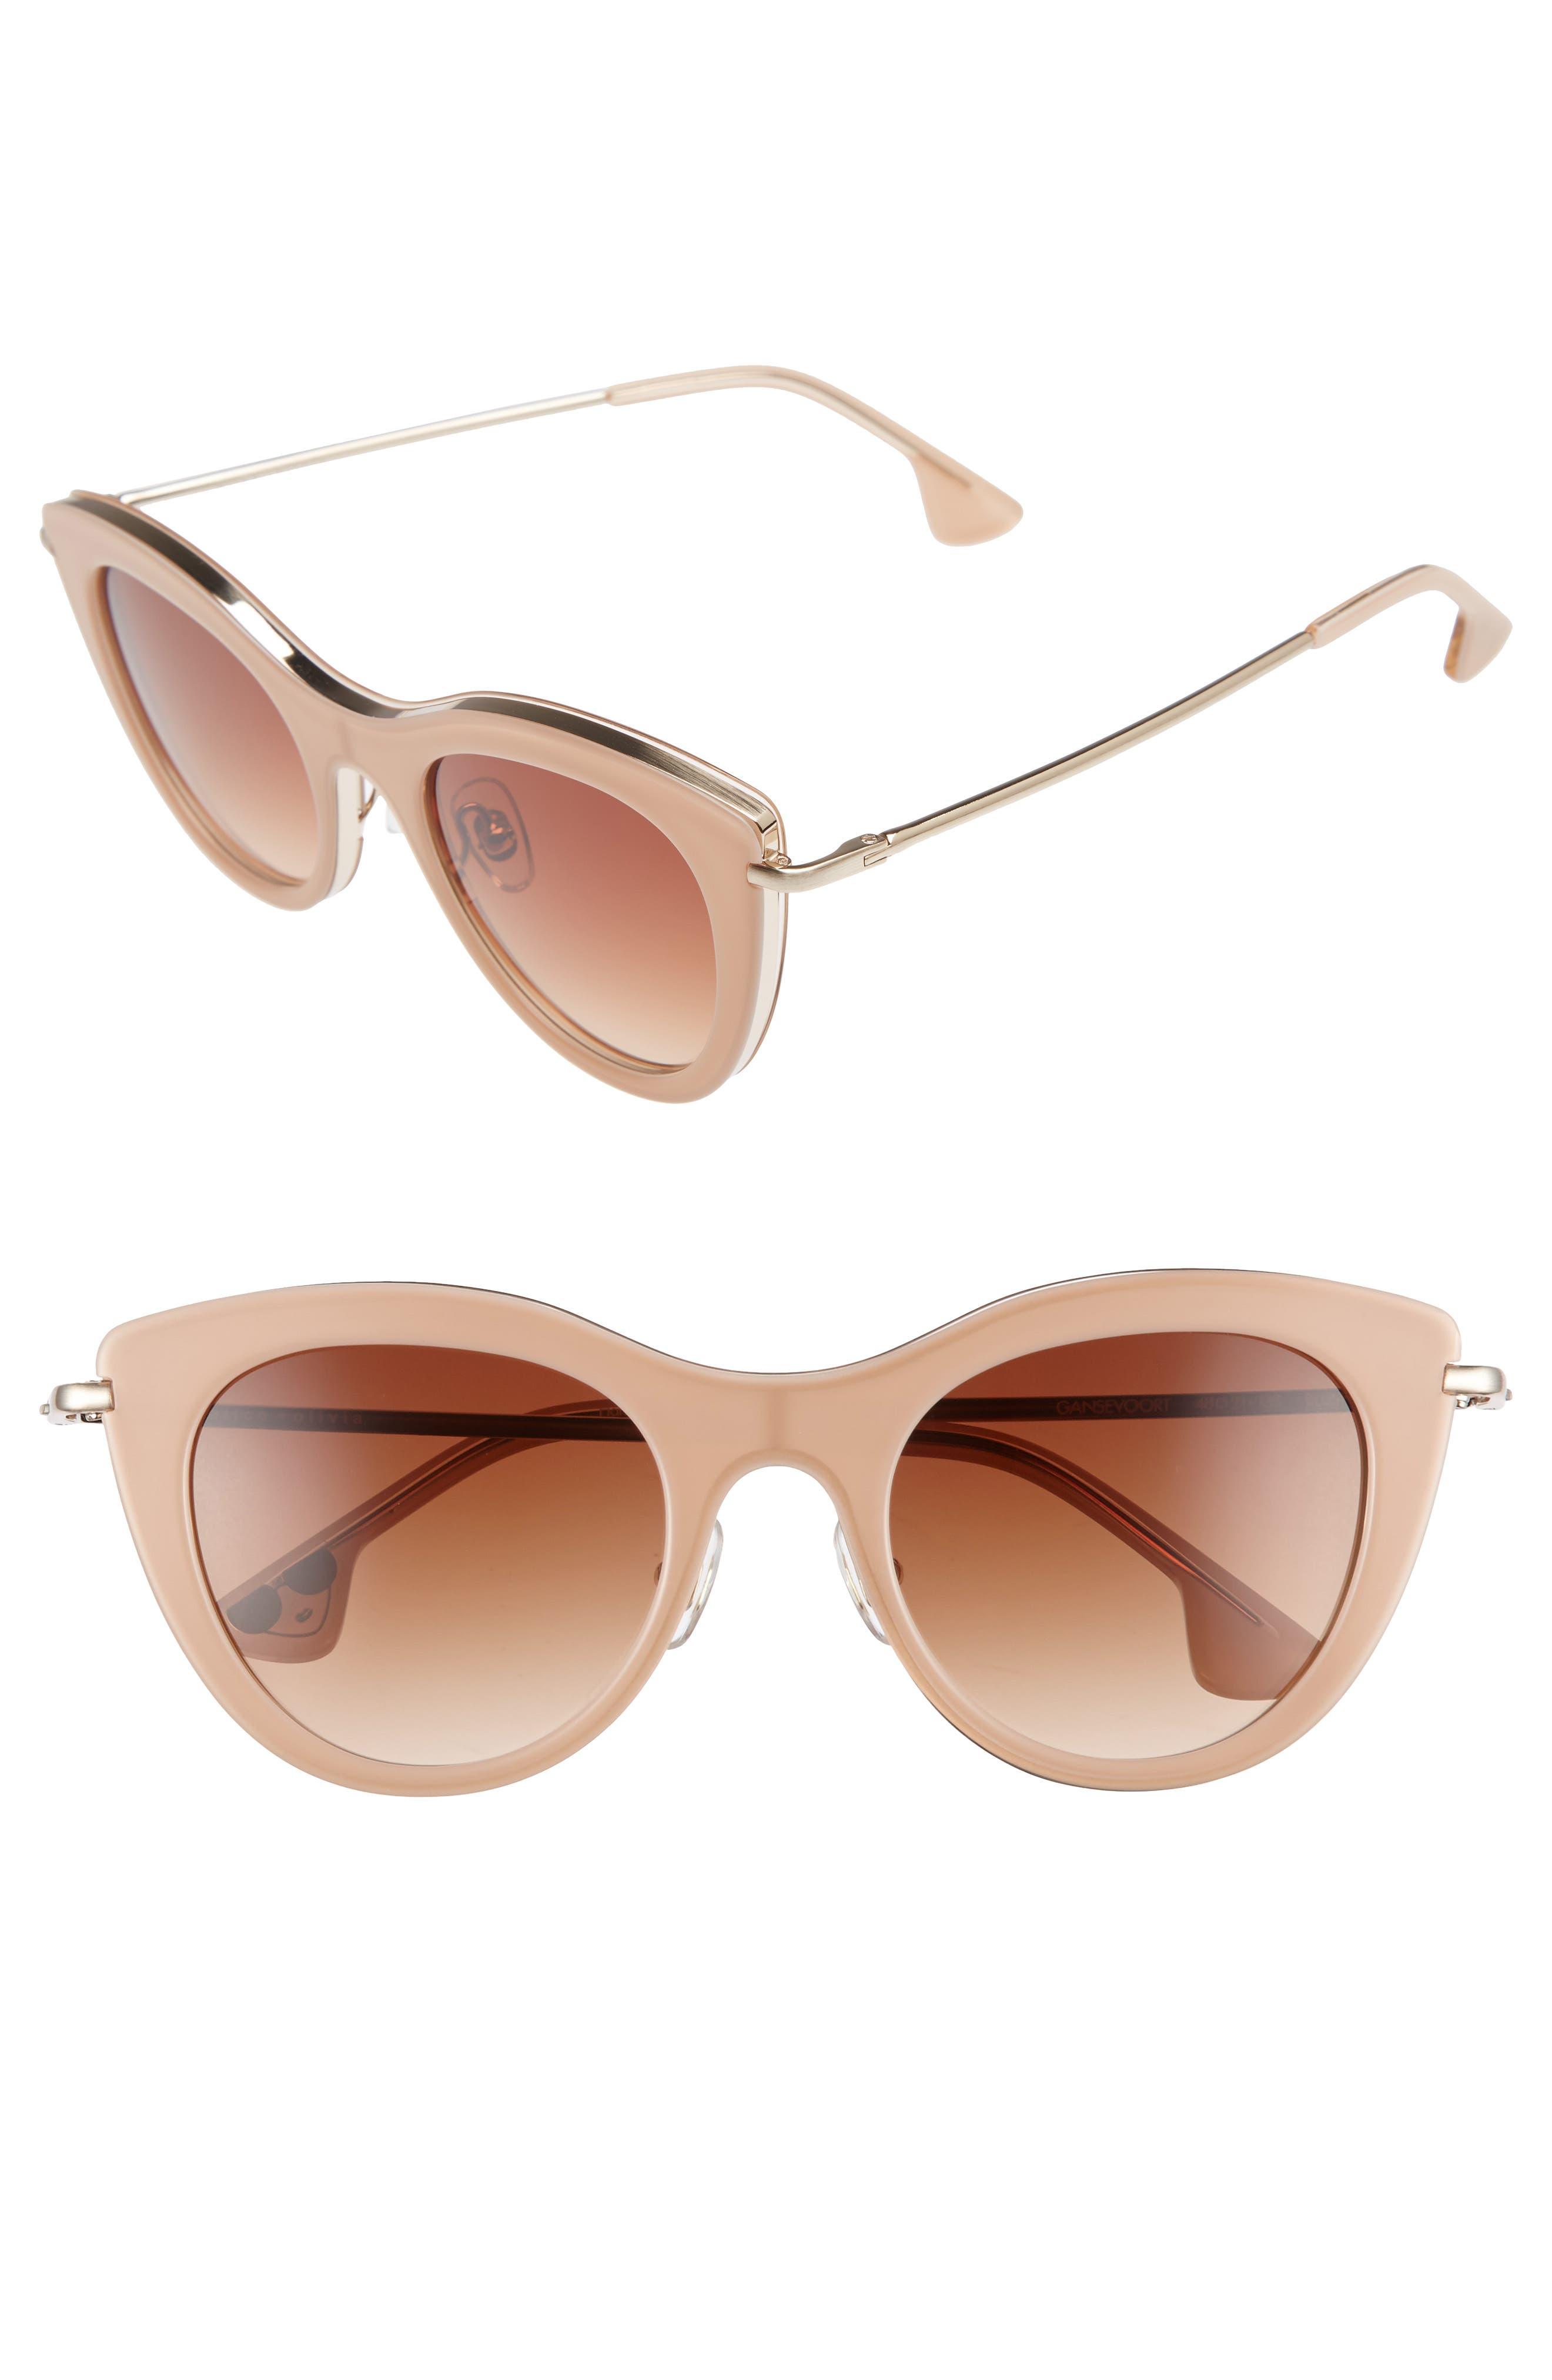 Gansevoort 48mm Special Fit Cat Eye Sunglasses,                             Main thumbnail 3, color,